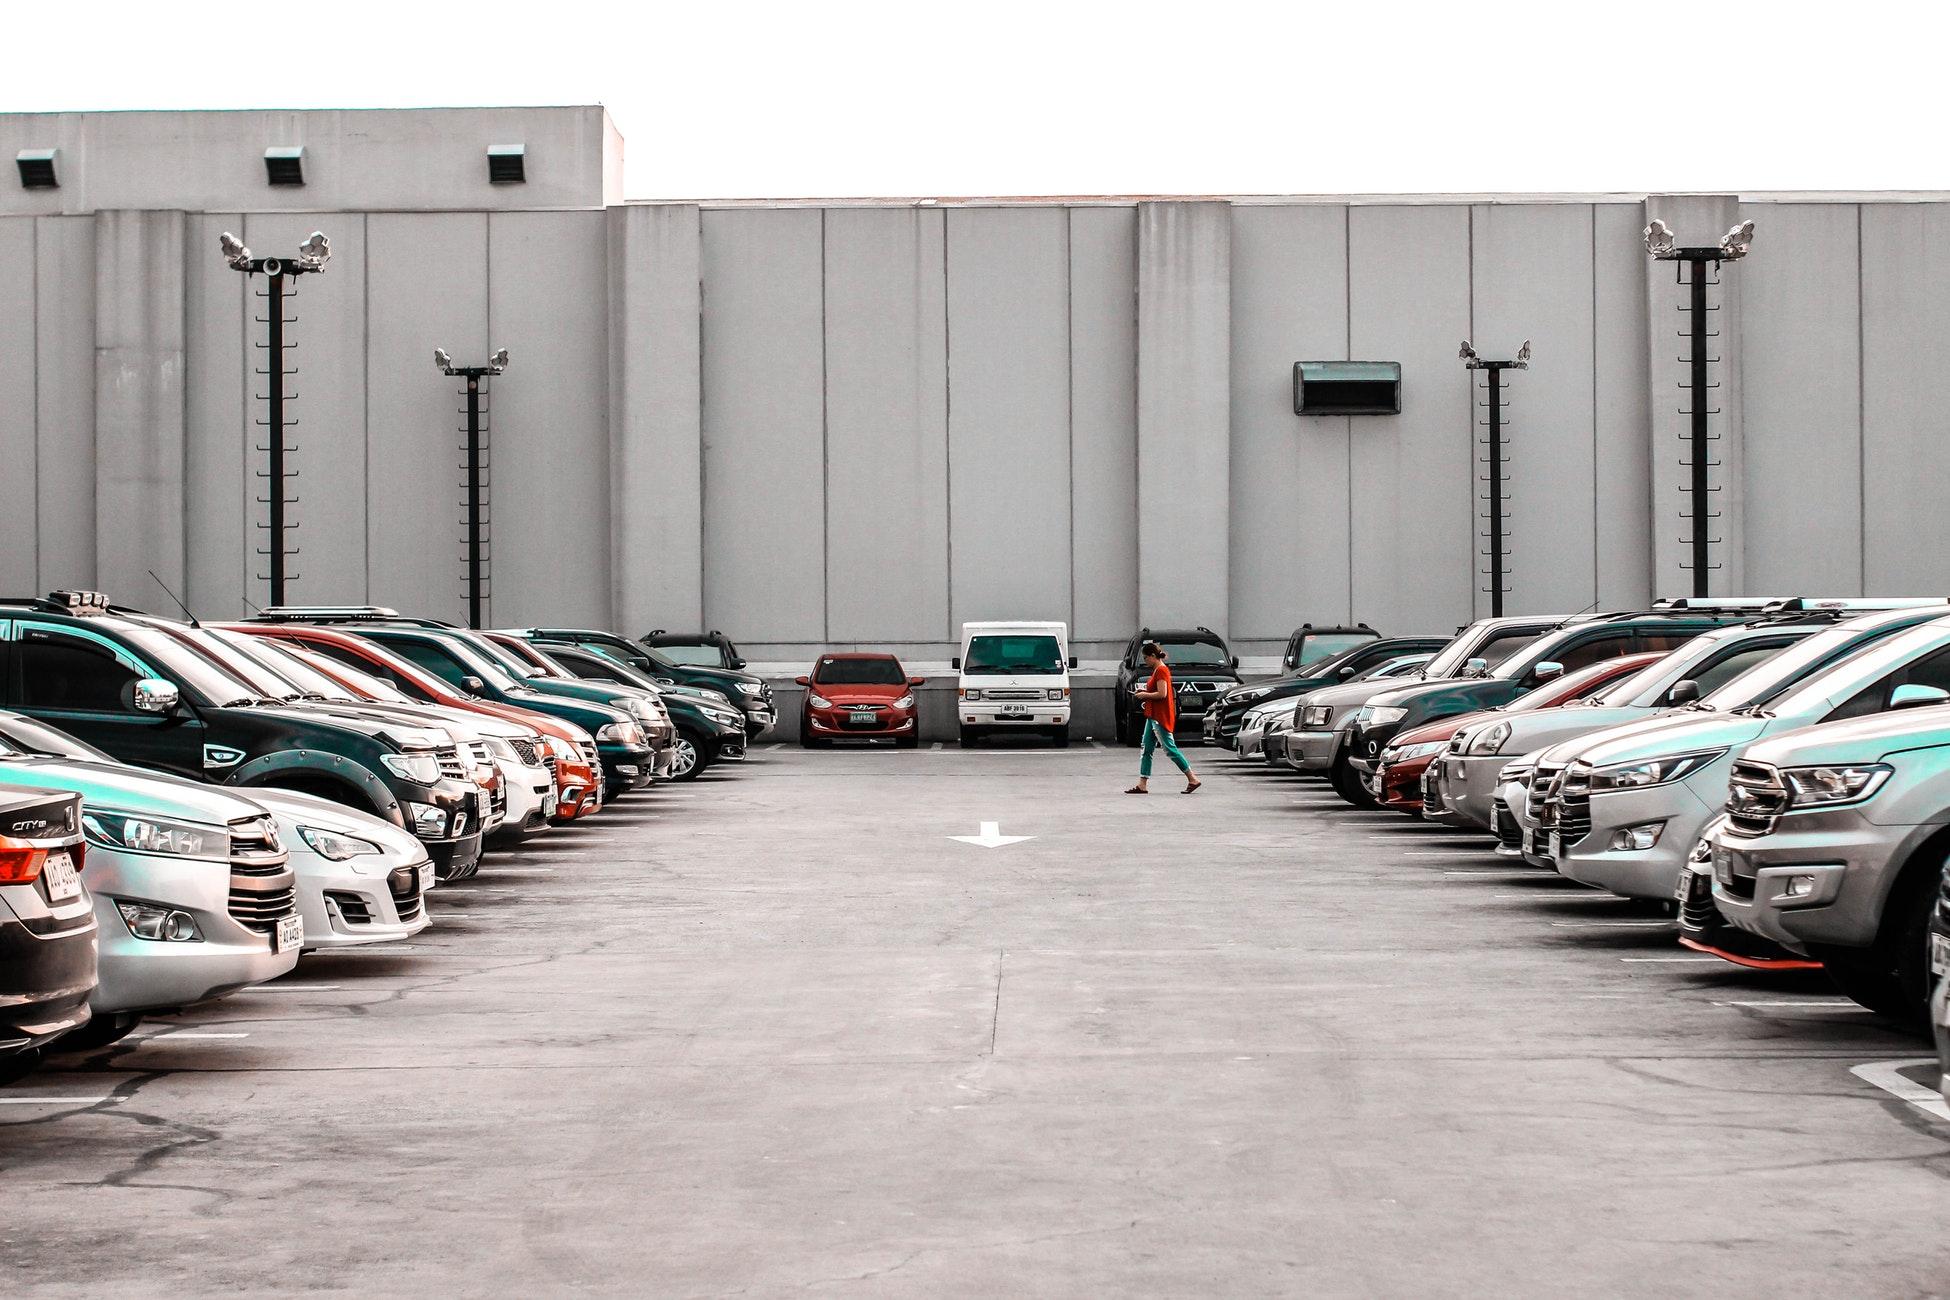 Parking Deals Australia Parking Discounts for Student 学生泊车优惠